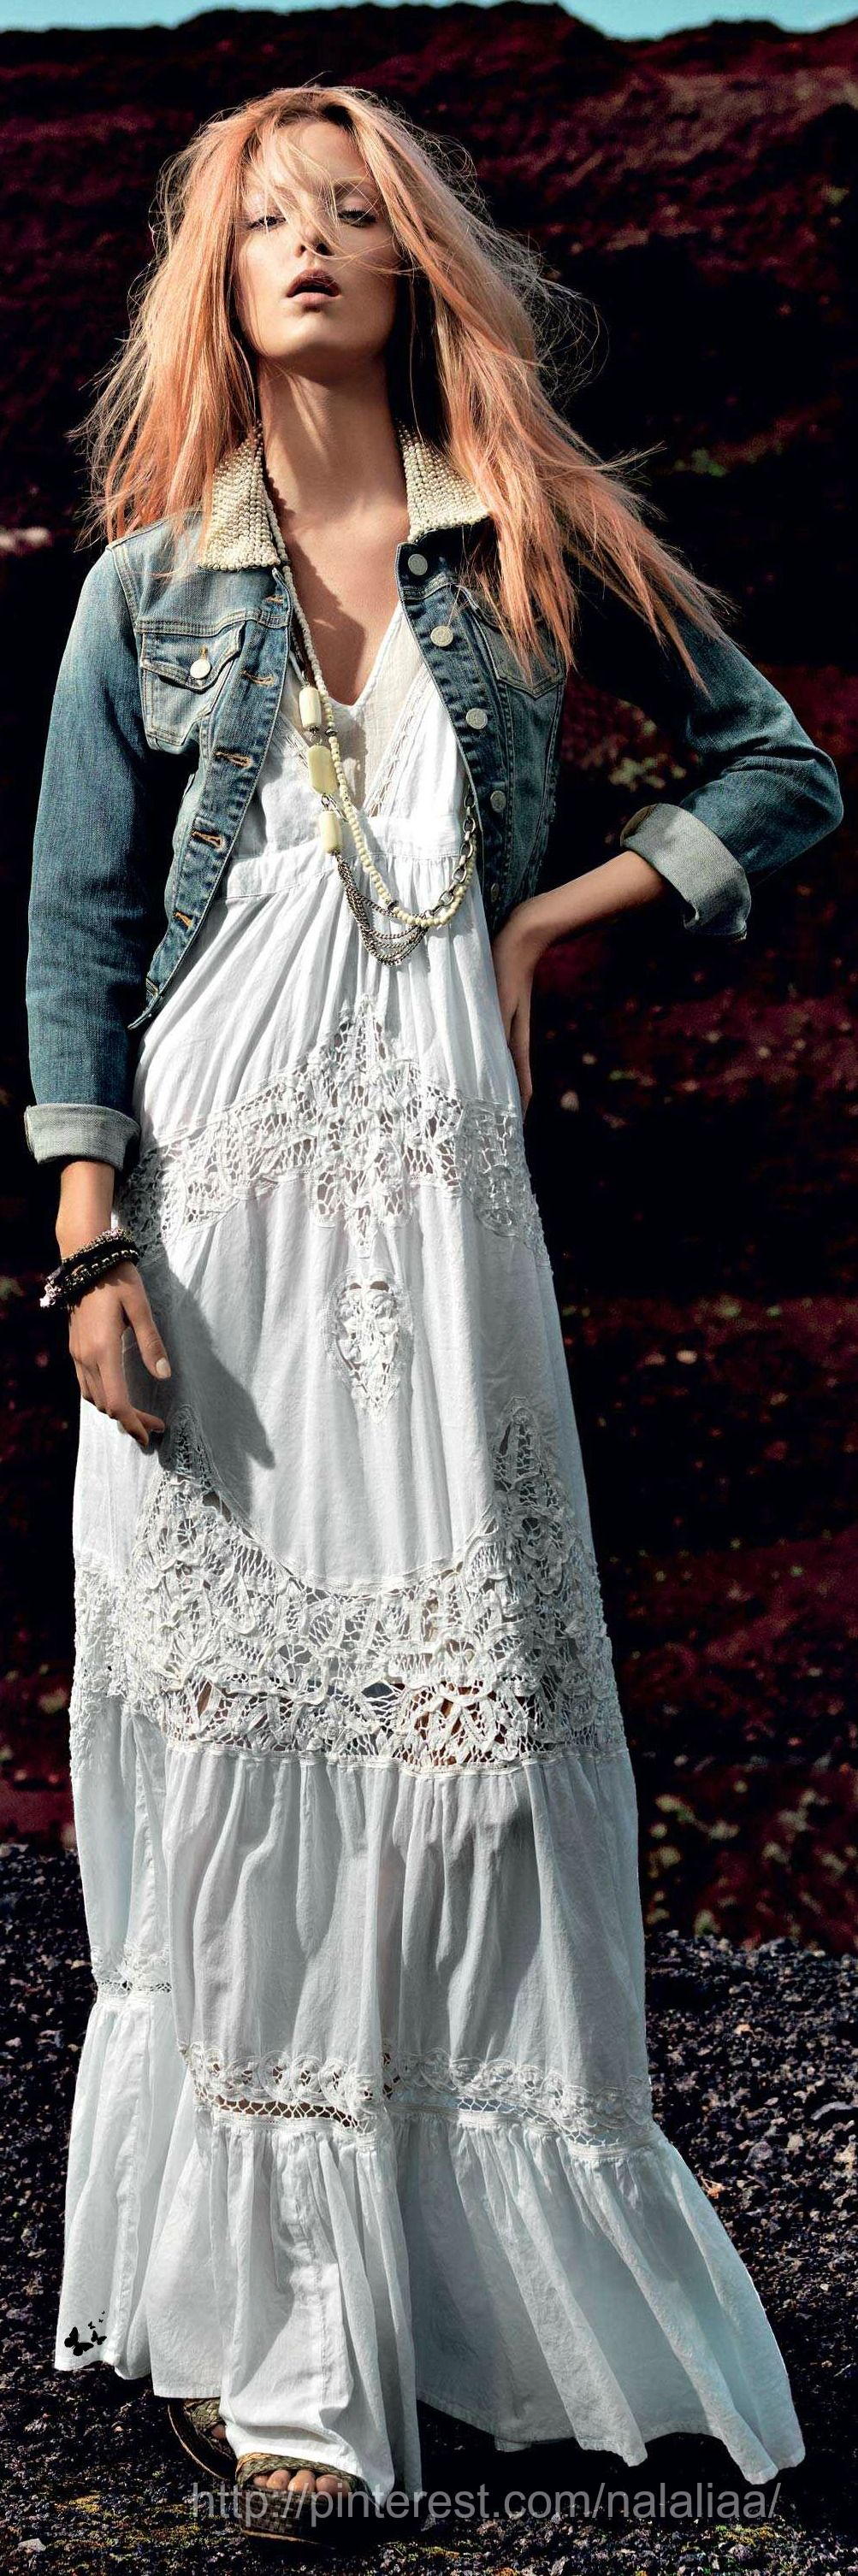 style boh me robe longue blanche robelongue blanche style boh me hippie ethnique indien. Black Bedroom Furniture Sets. Home Design Ideas